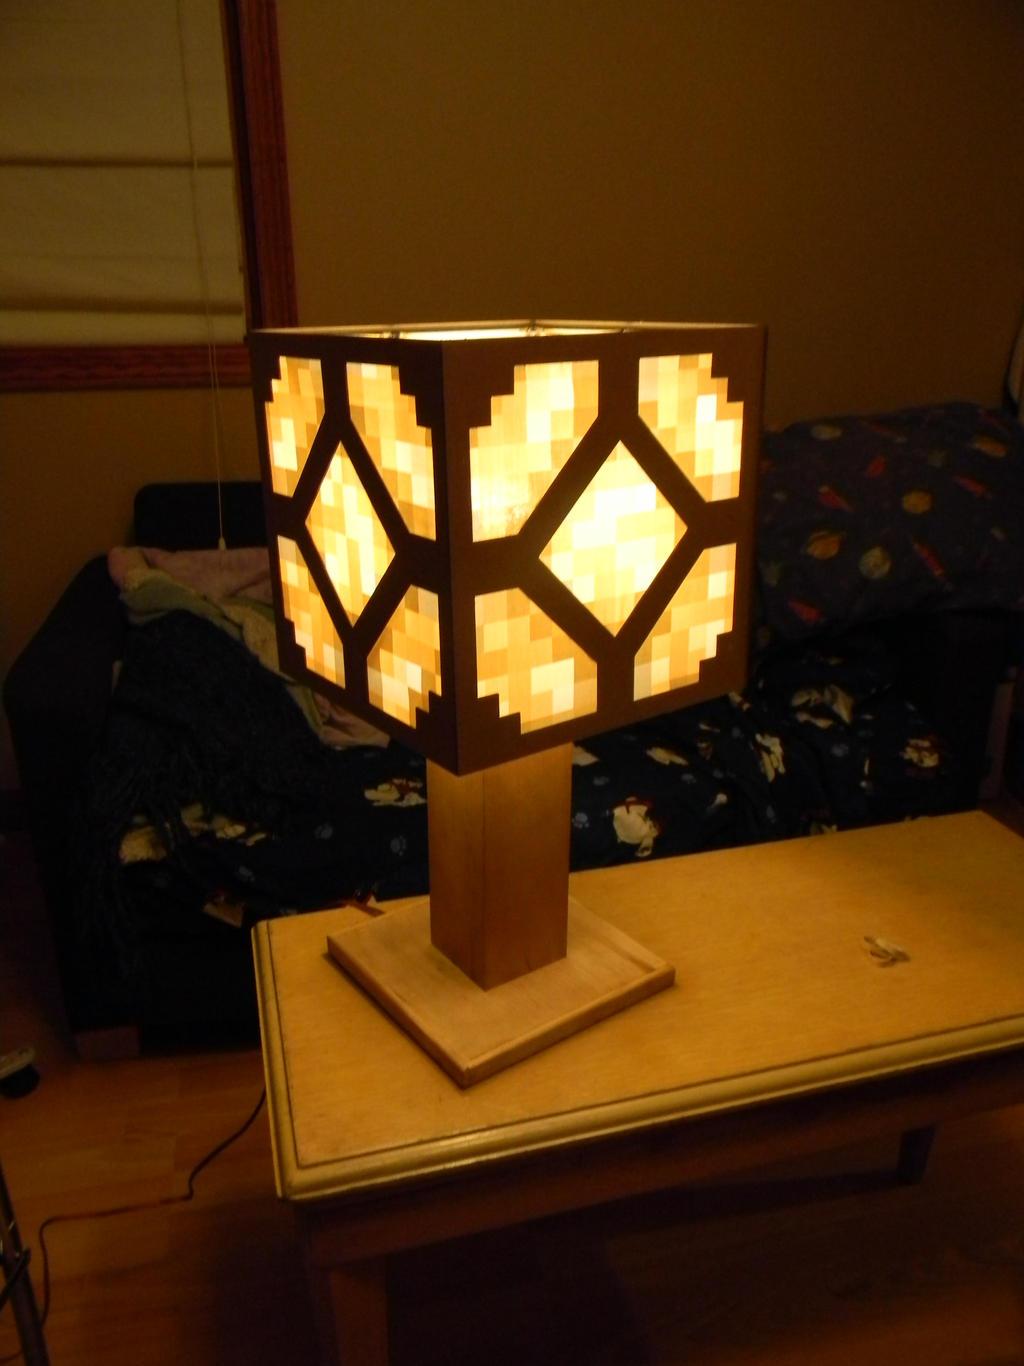 Redstone lamp minecraft by veykava on deviantart redstone lamp minecraft by veykava redstone lamp minecraft by veykava aloadofball Gallery